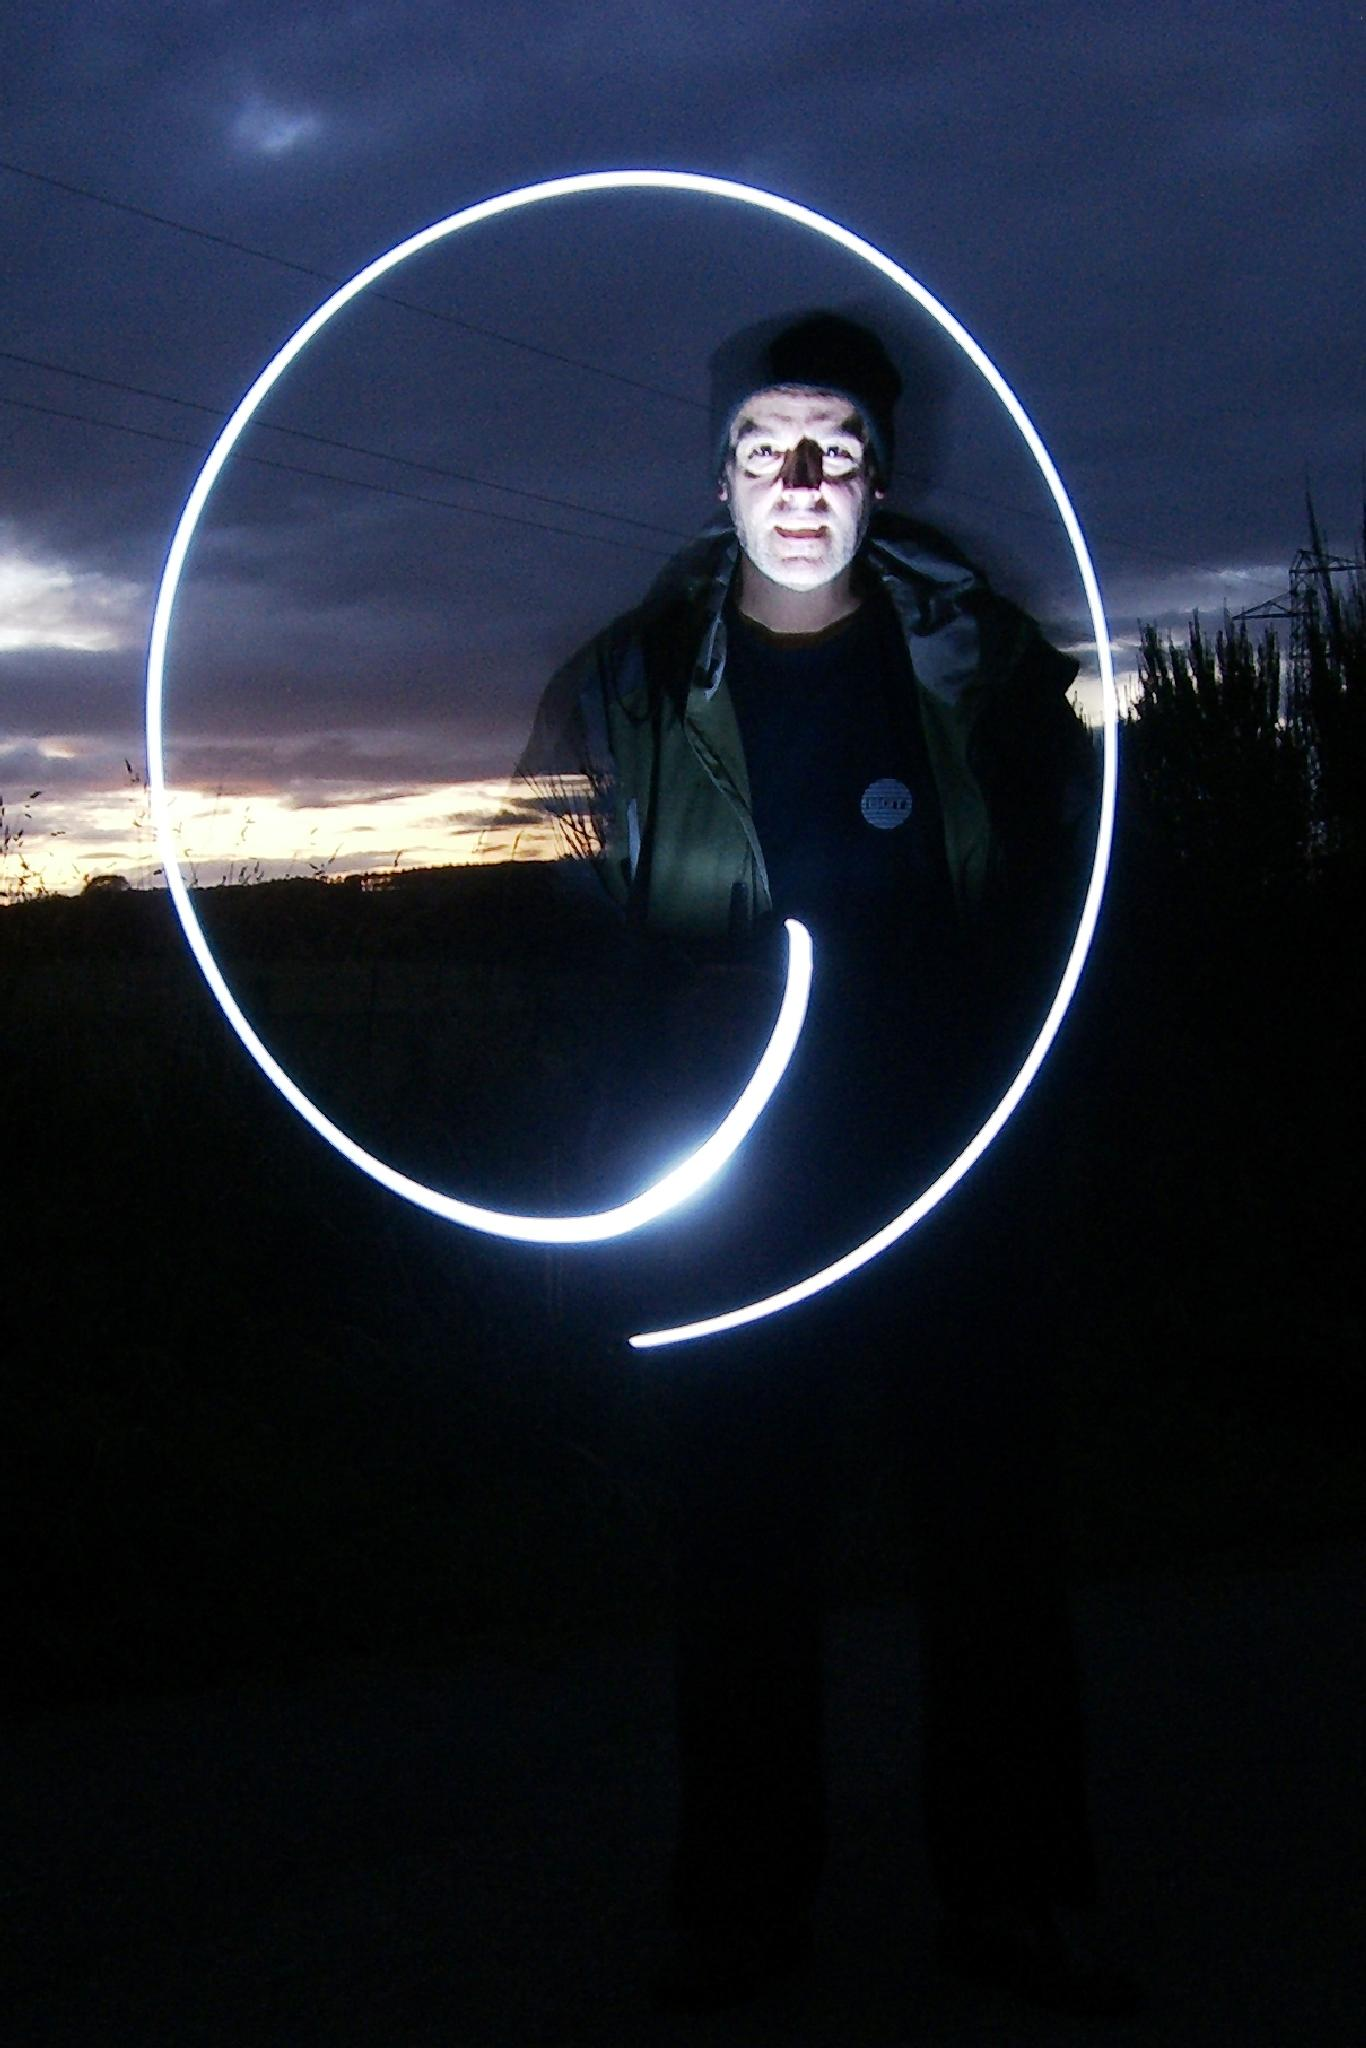 Ring of light by Warren